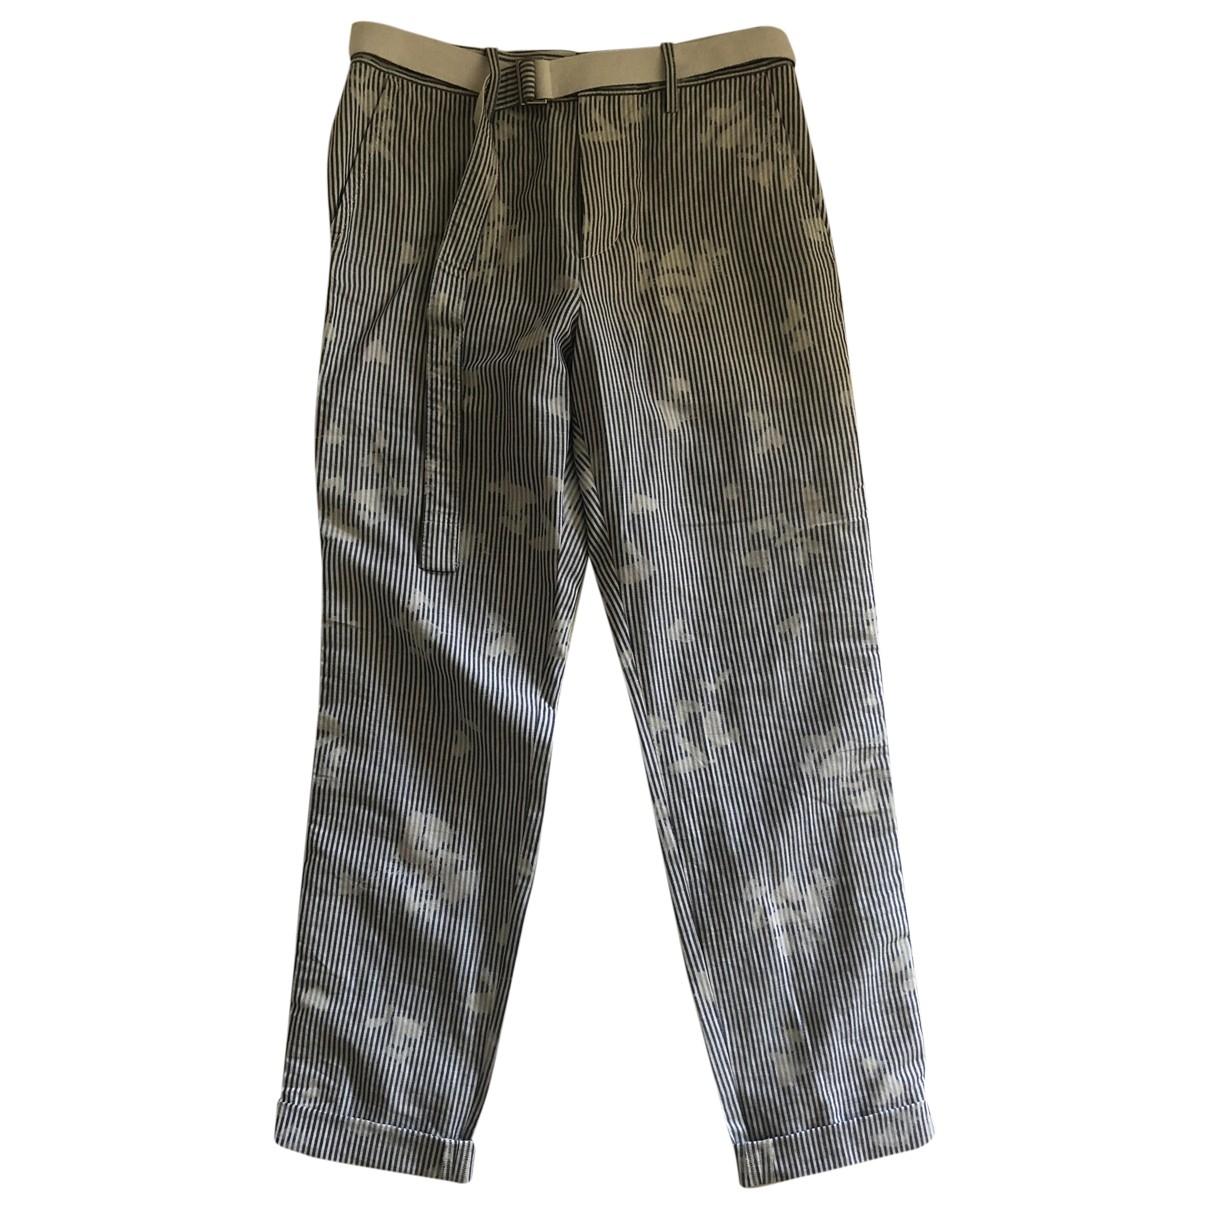 Sacai \N Blue Cotton Trousers for Men S International